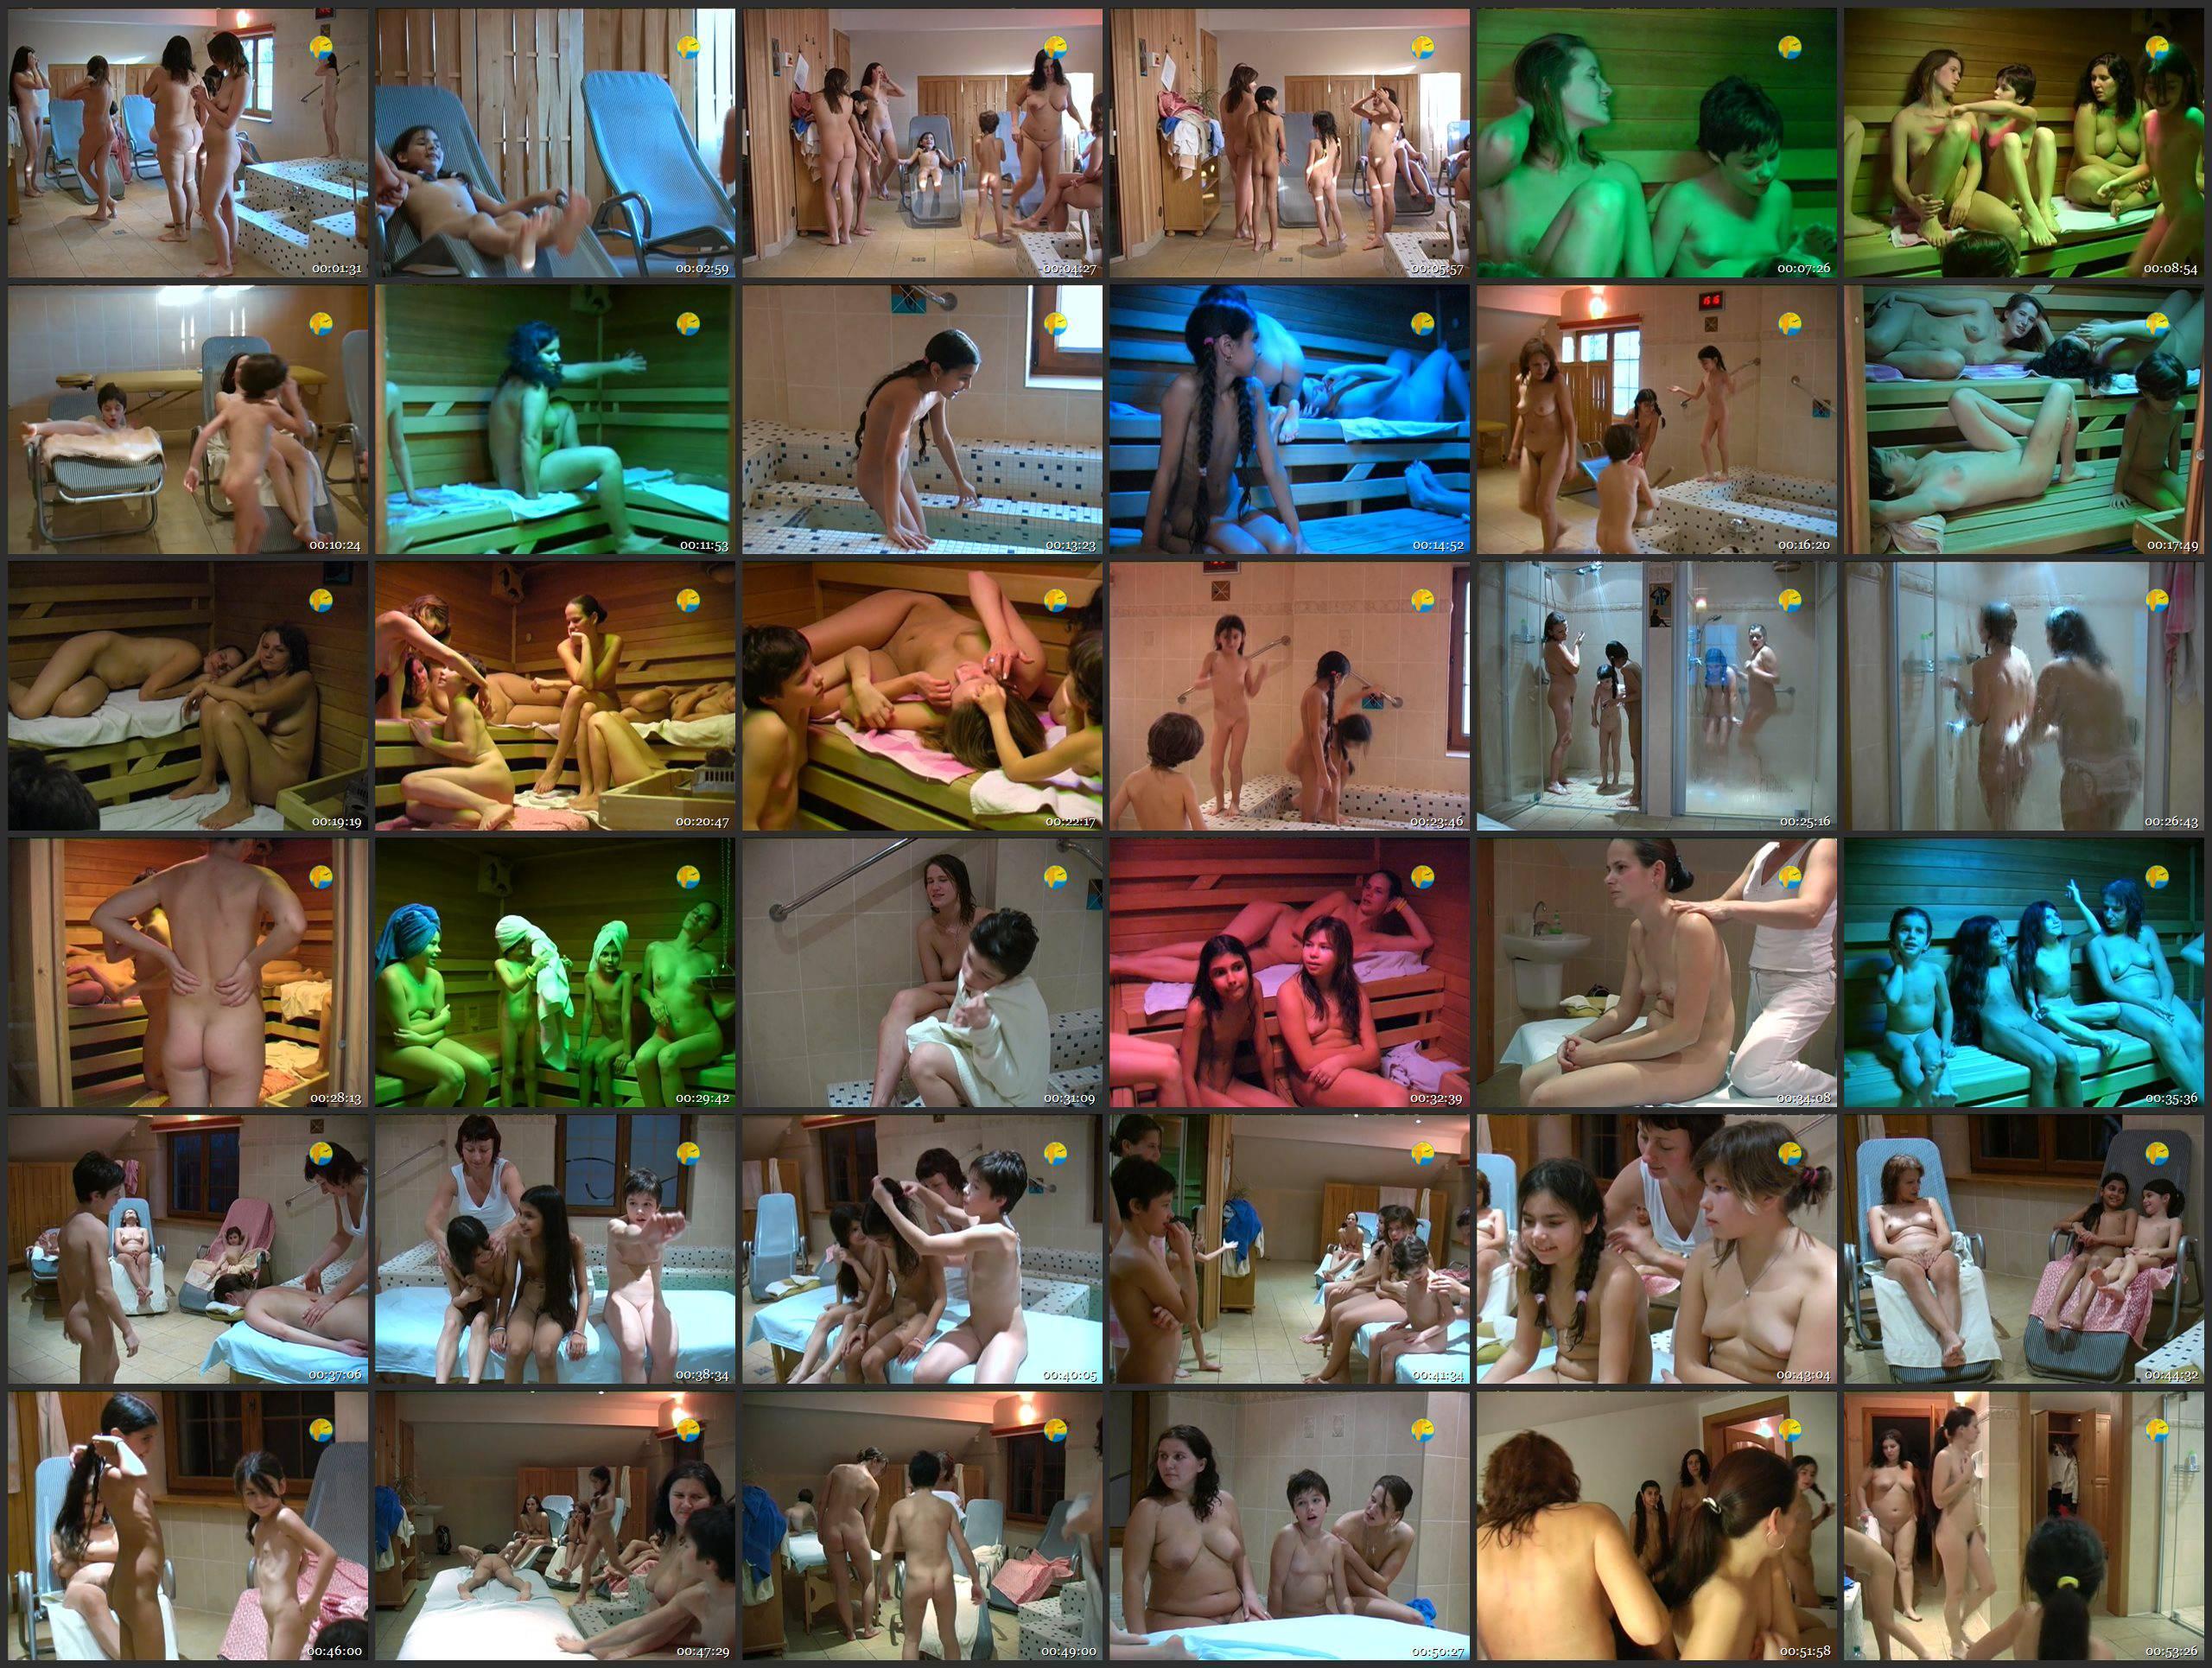 Naturist Freedom Girls in Sauna - Thumbnails